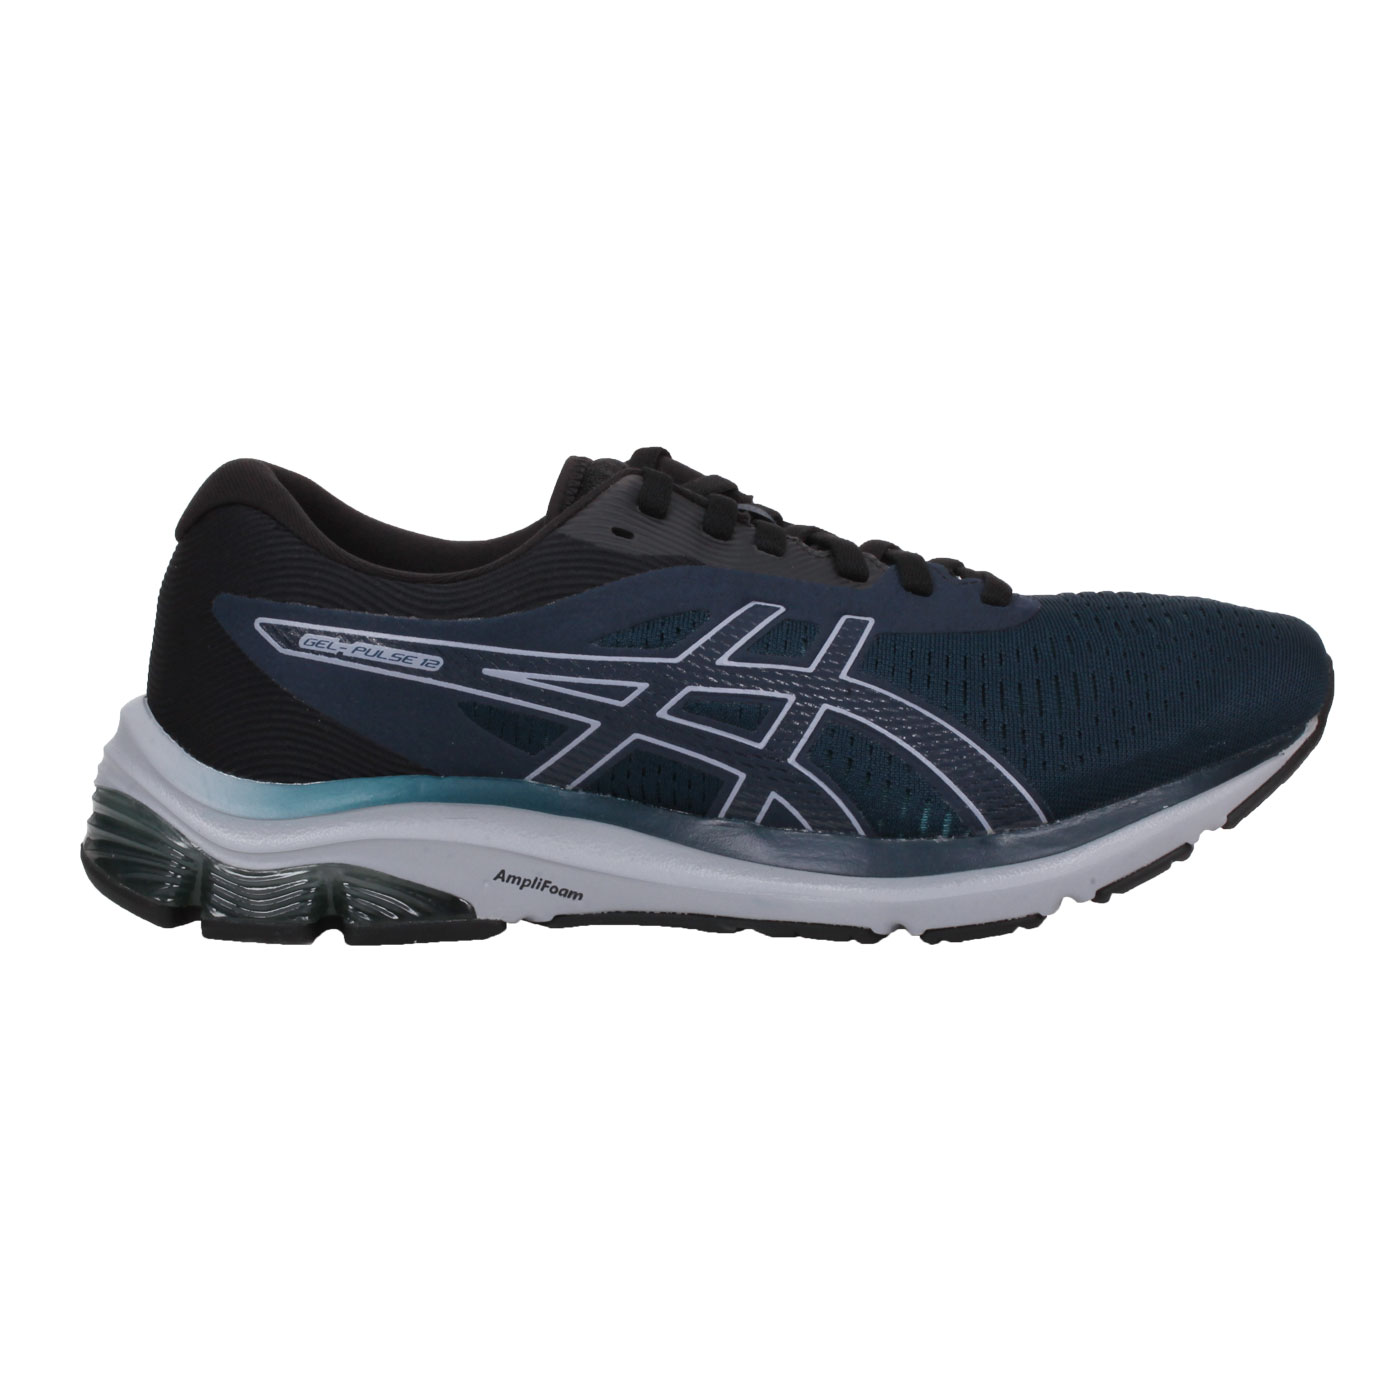 ASICS 男款慢跑鞋  @GEL PULSE 12@1011A844-403 - 藍綠黑